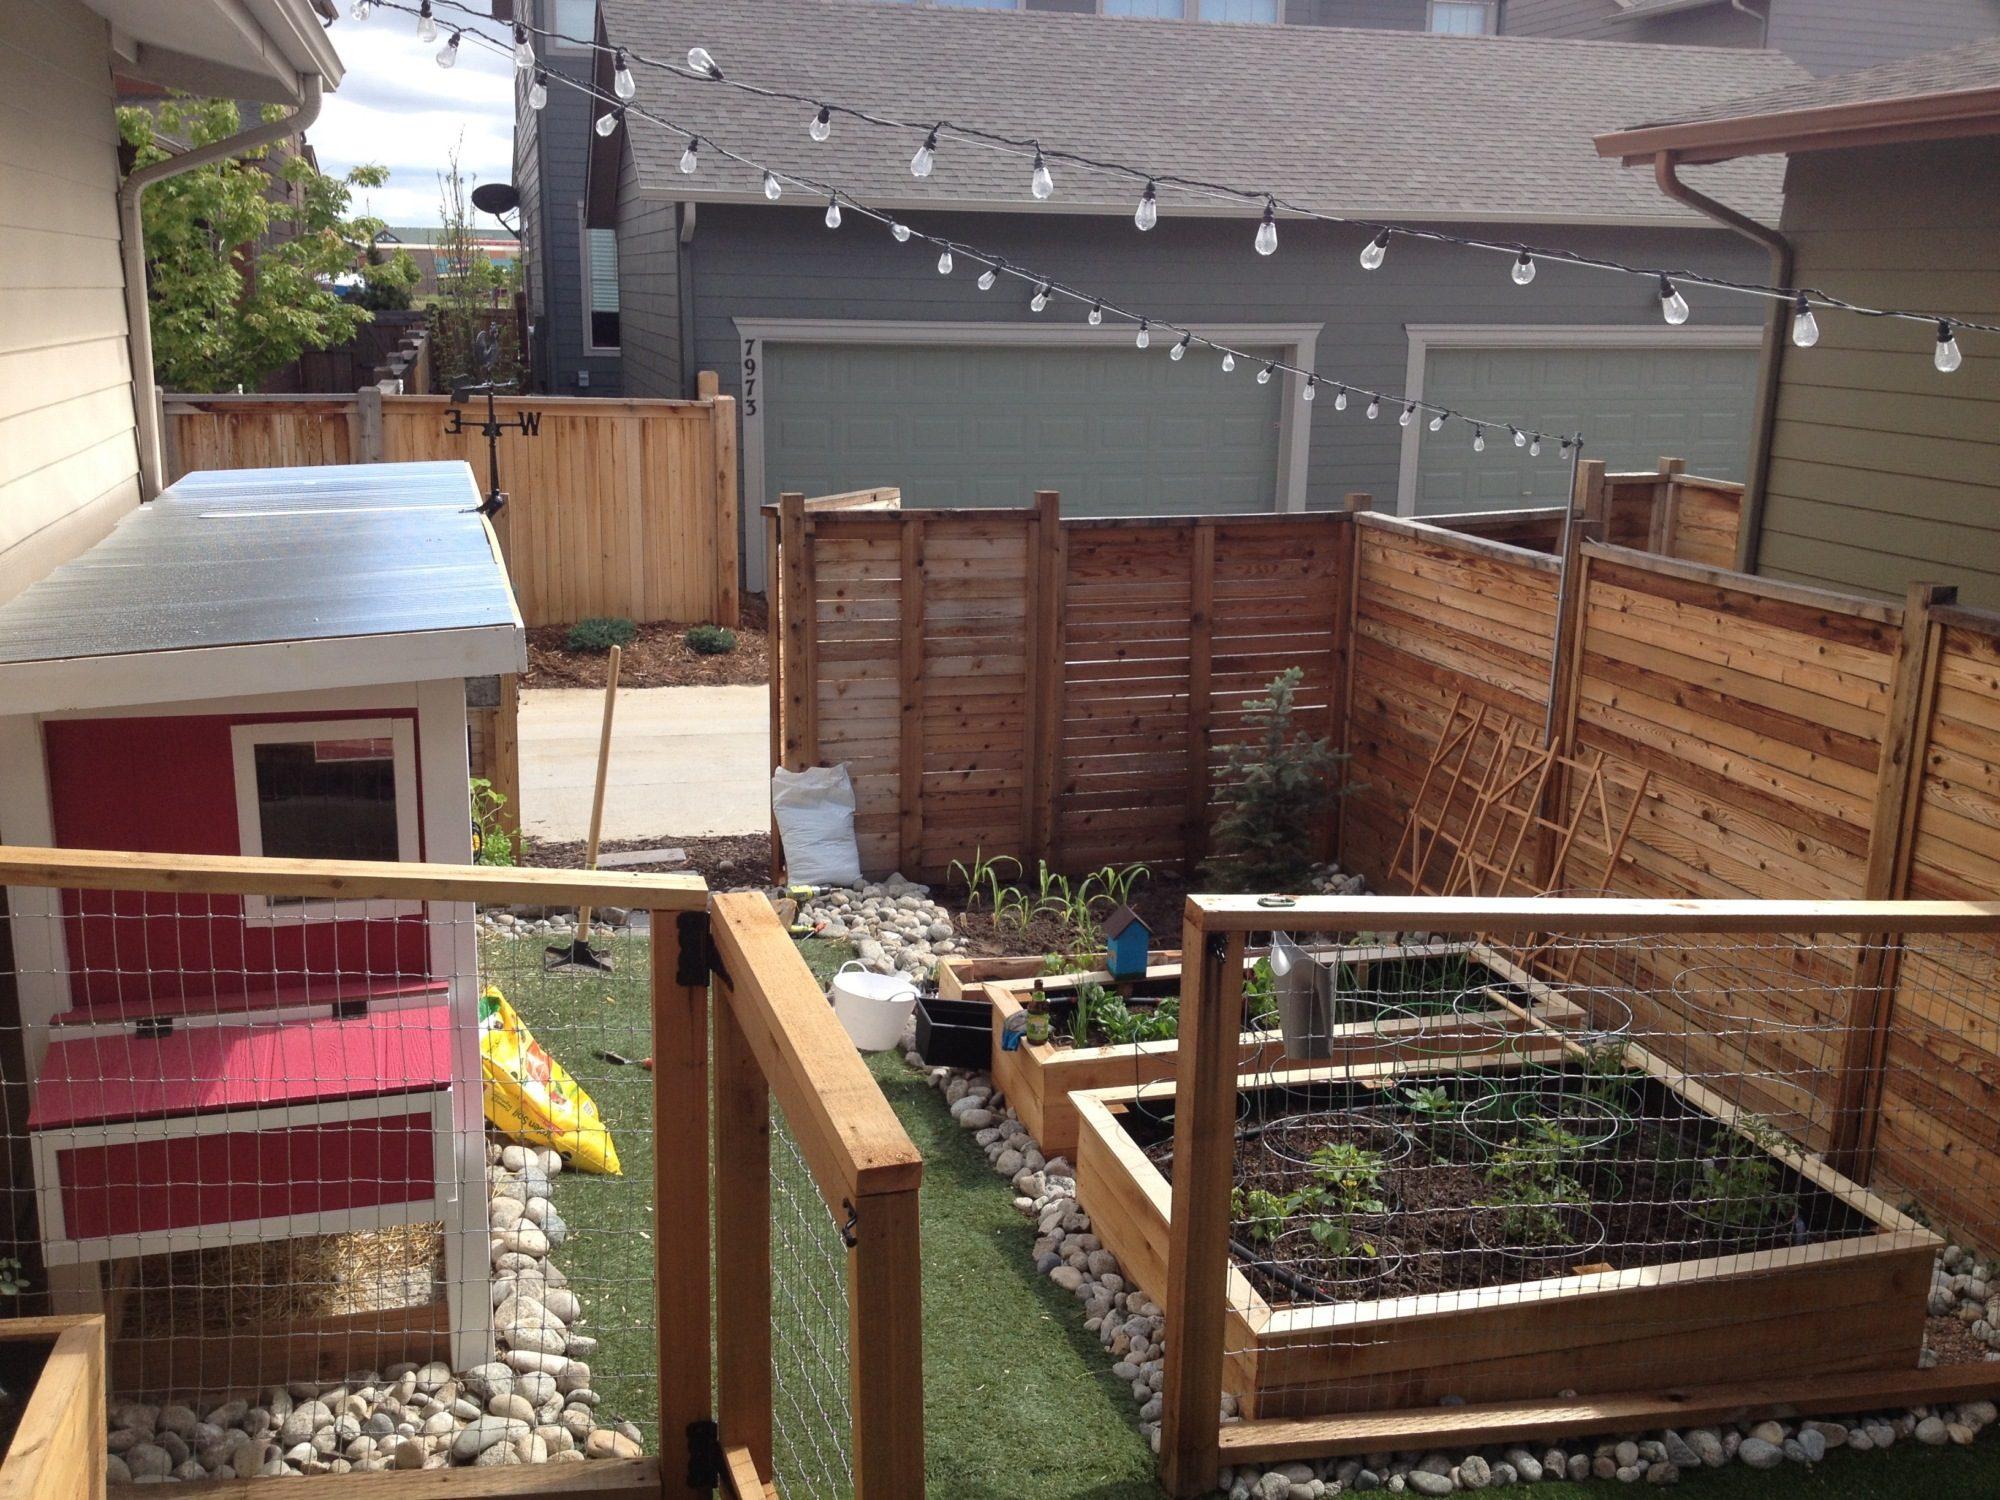 jurassic bawk coop on barfield urban farm backyard chickens